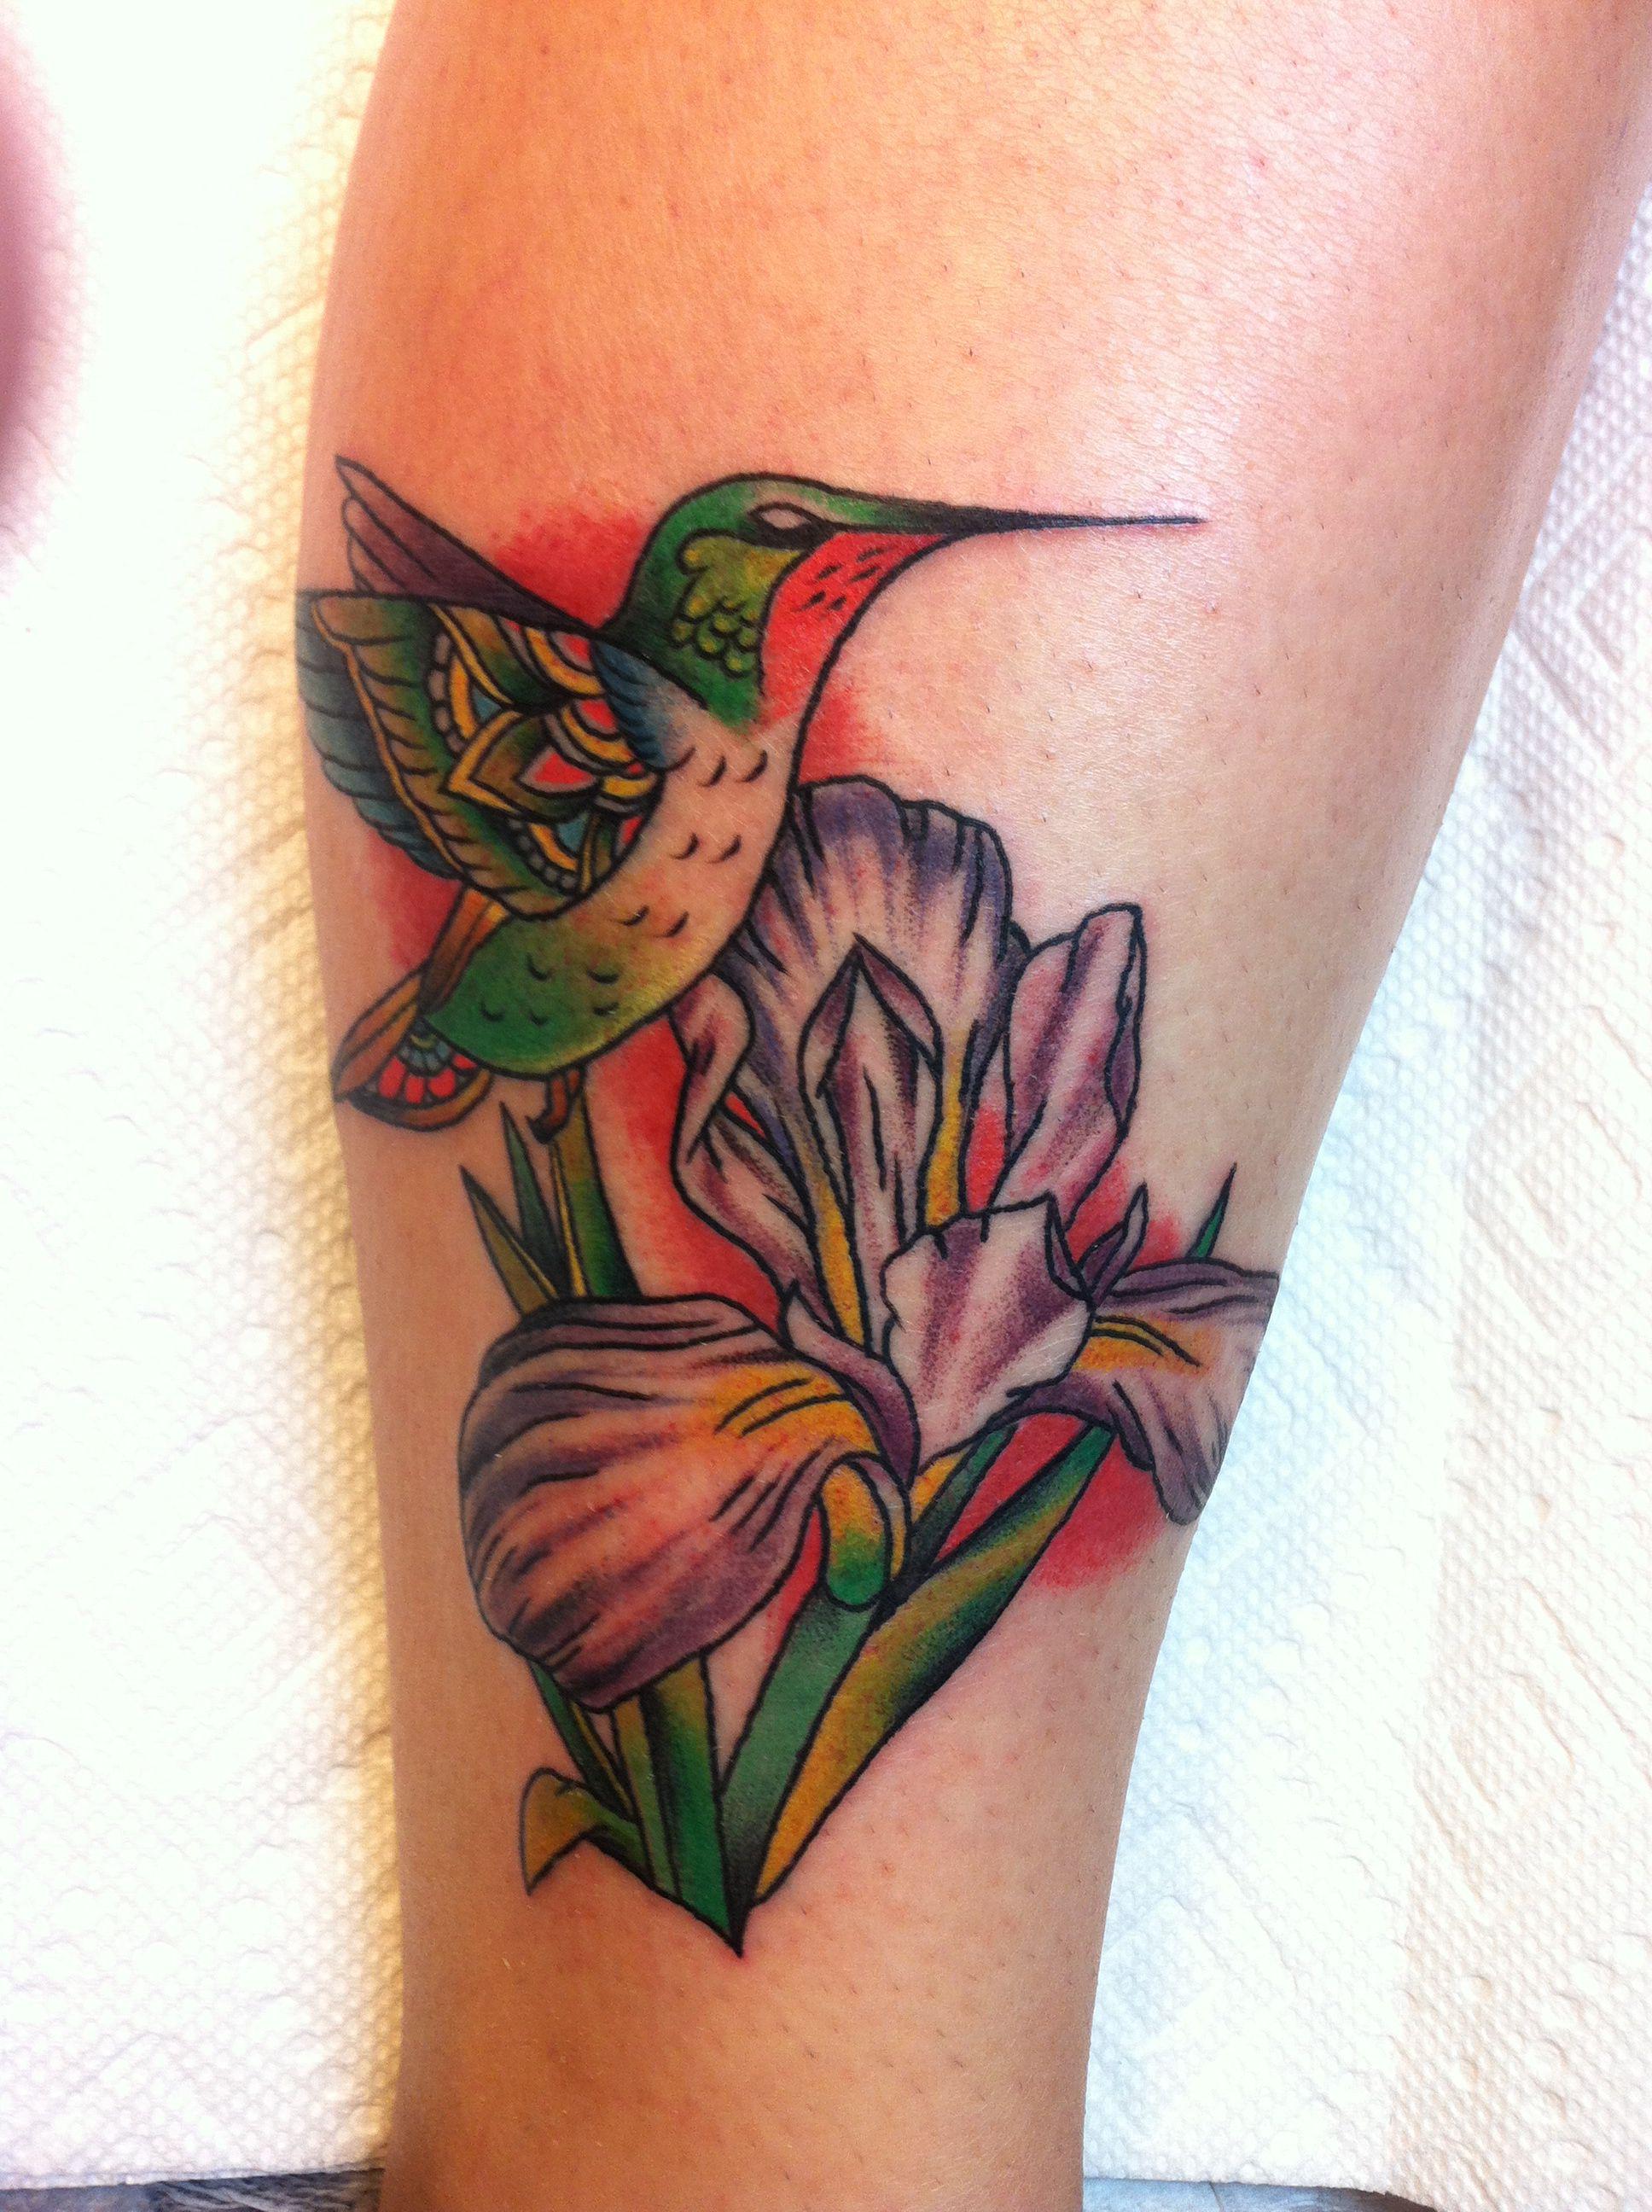 My awesome hummingbird and iris tattoo love it tattoos my awesome hummingbird and iris tattoo love it izmirmasajfo Images